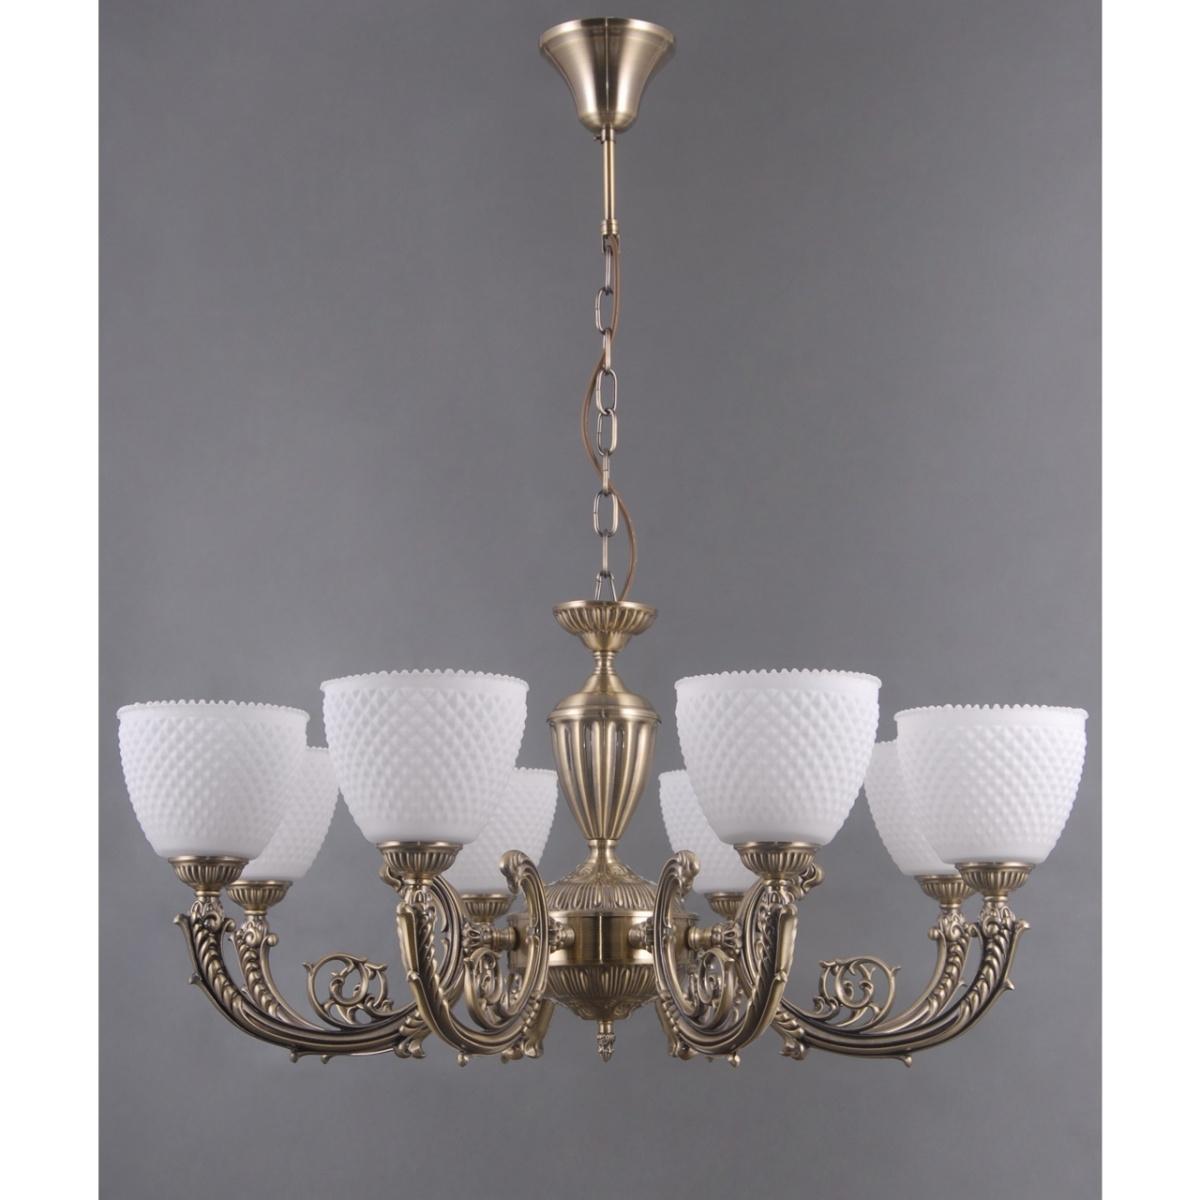 Lustra Light Classic Felice